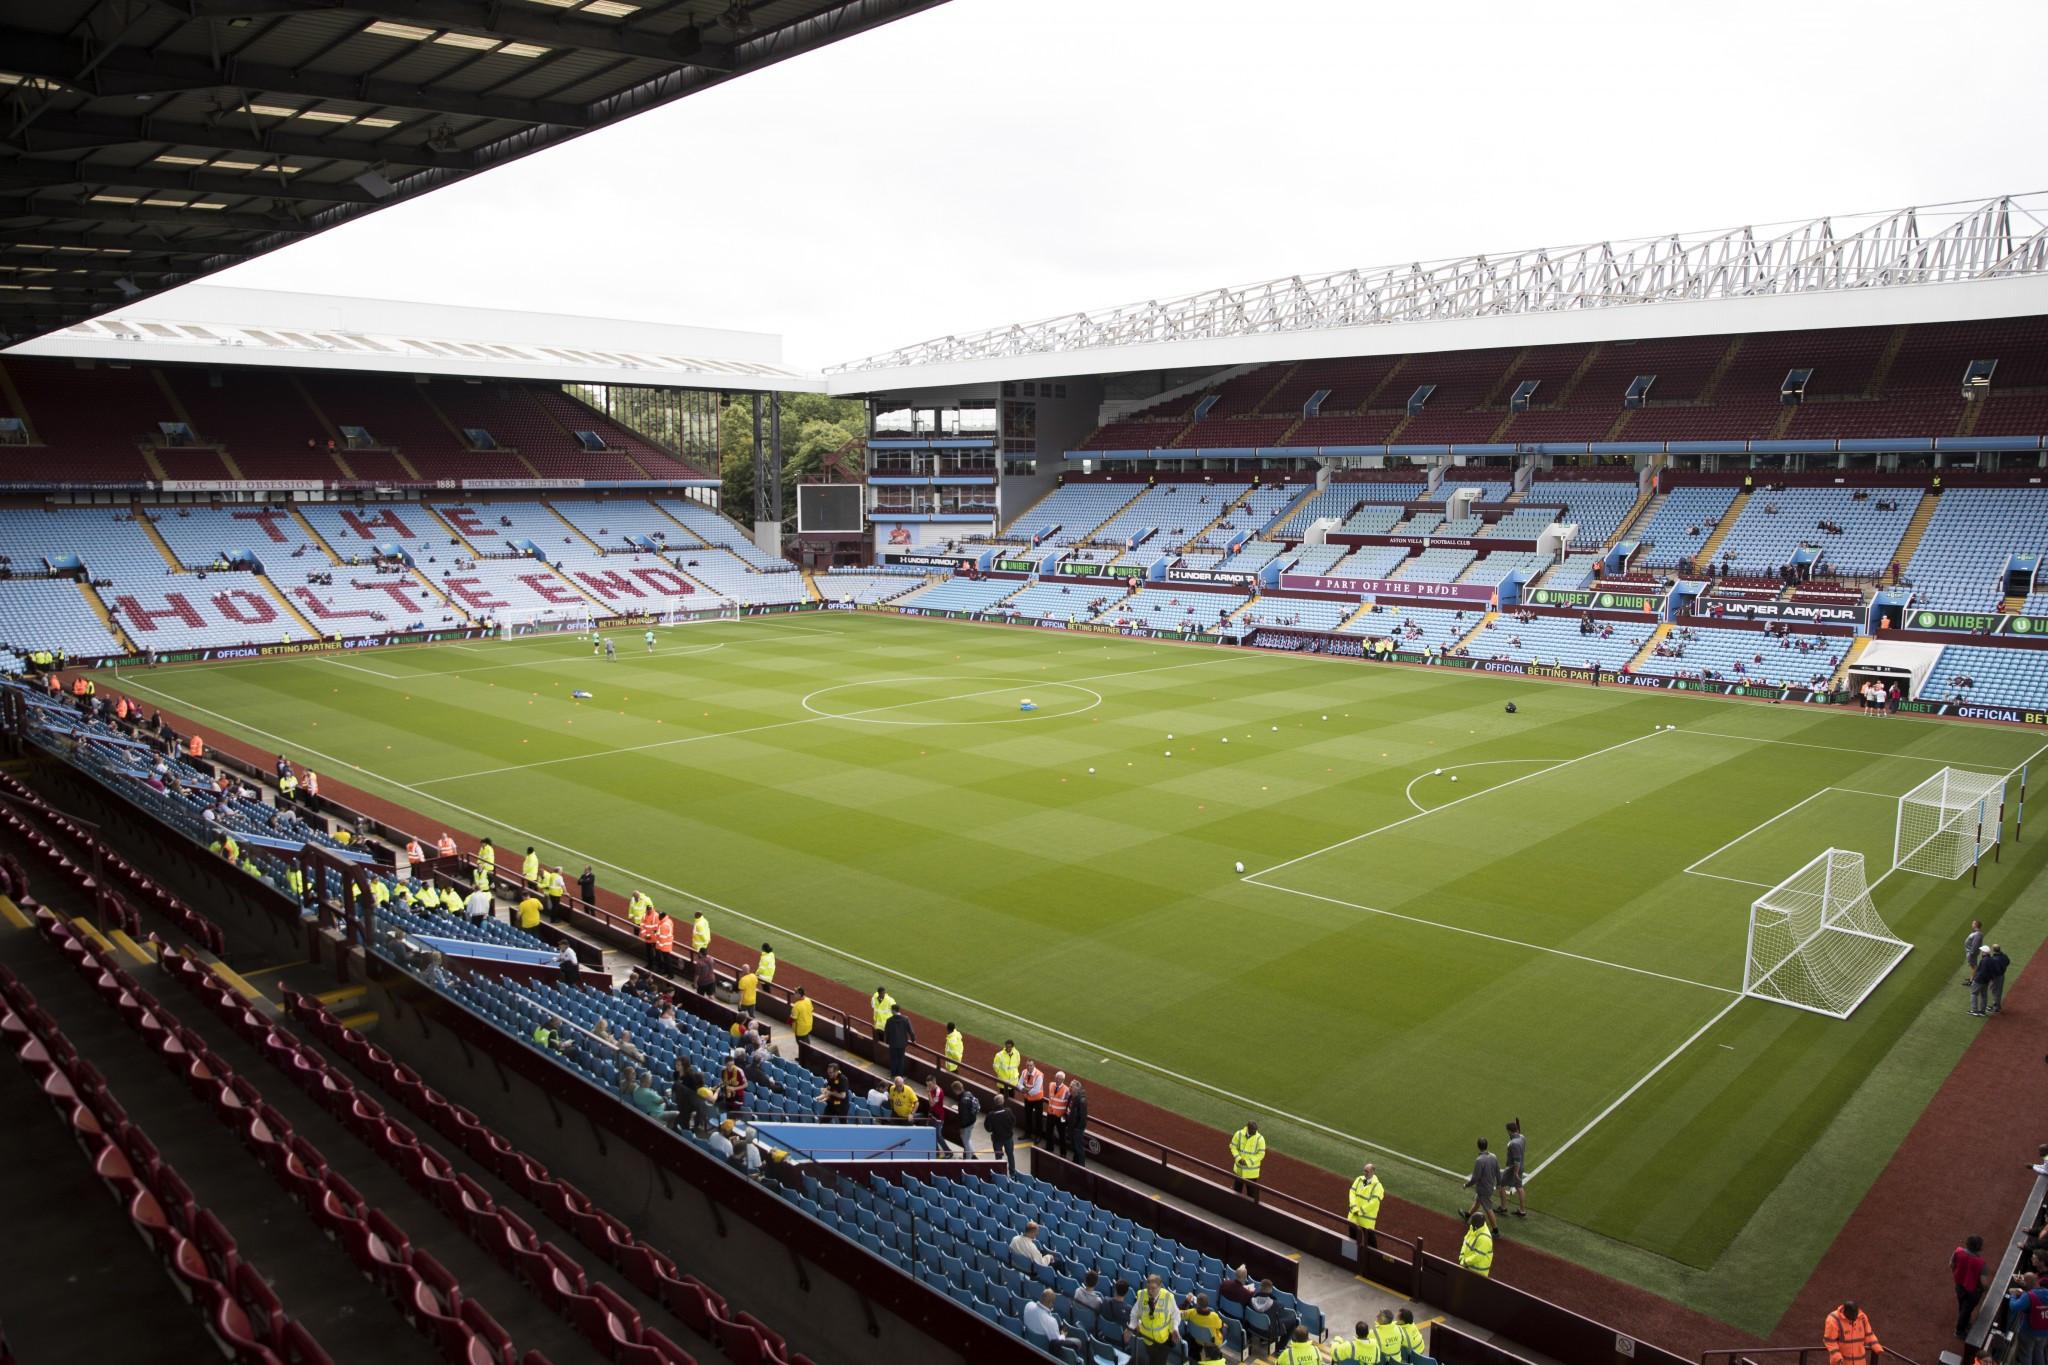 Aston Villa chief executive gives backing to Birmingham 2022 bid